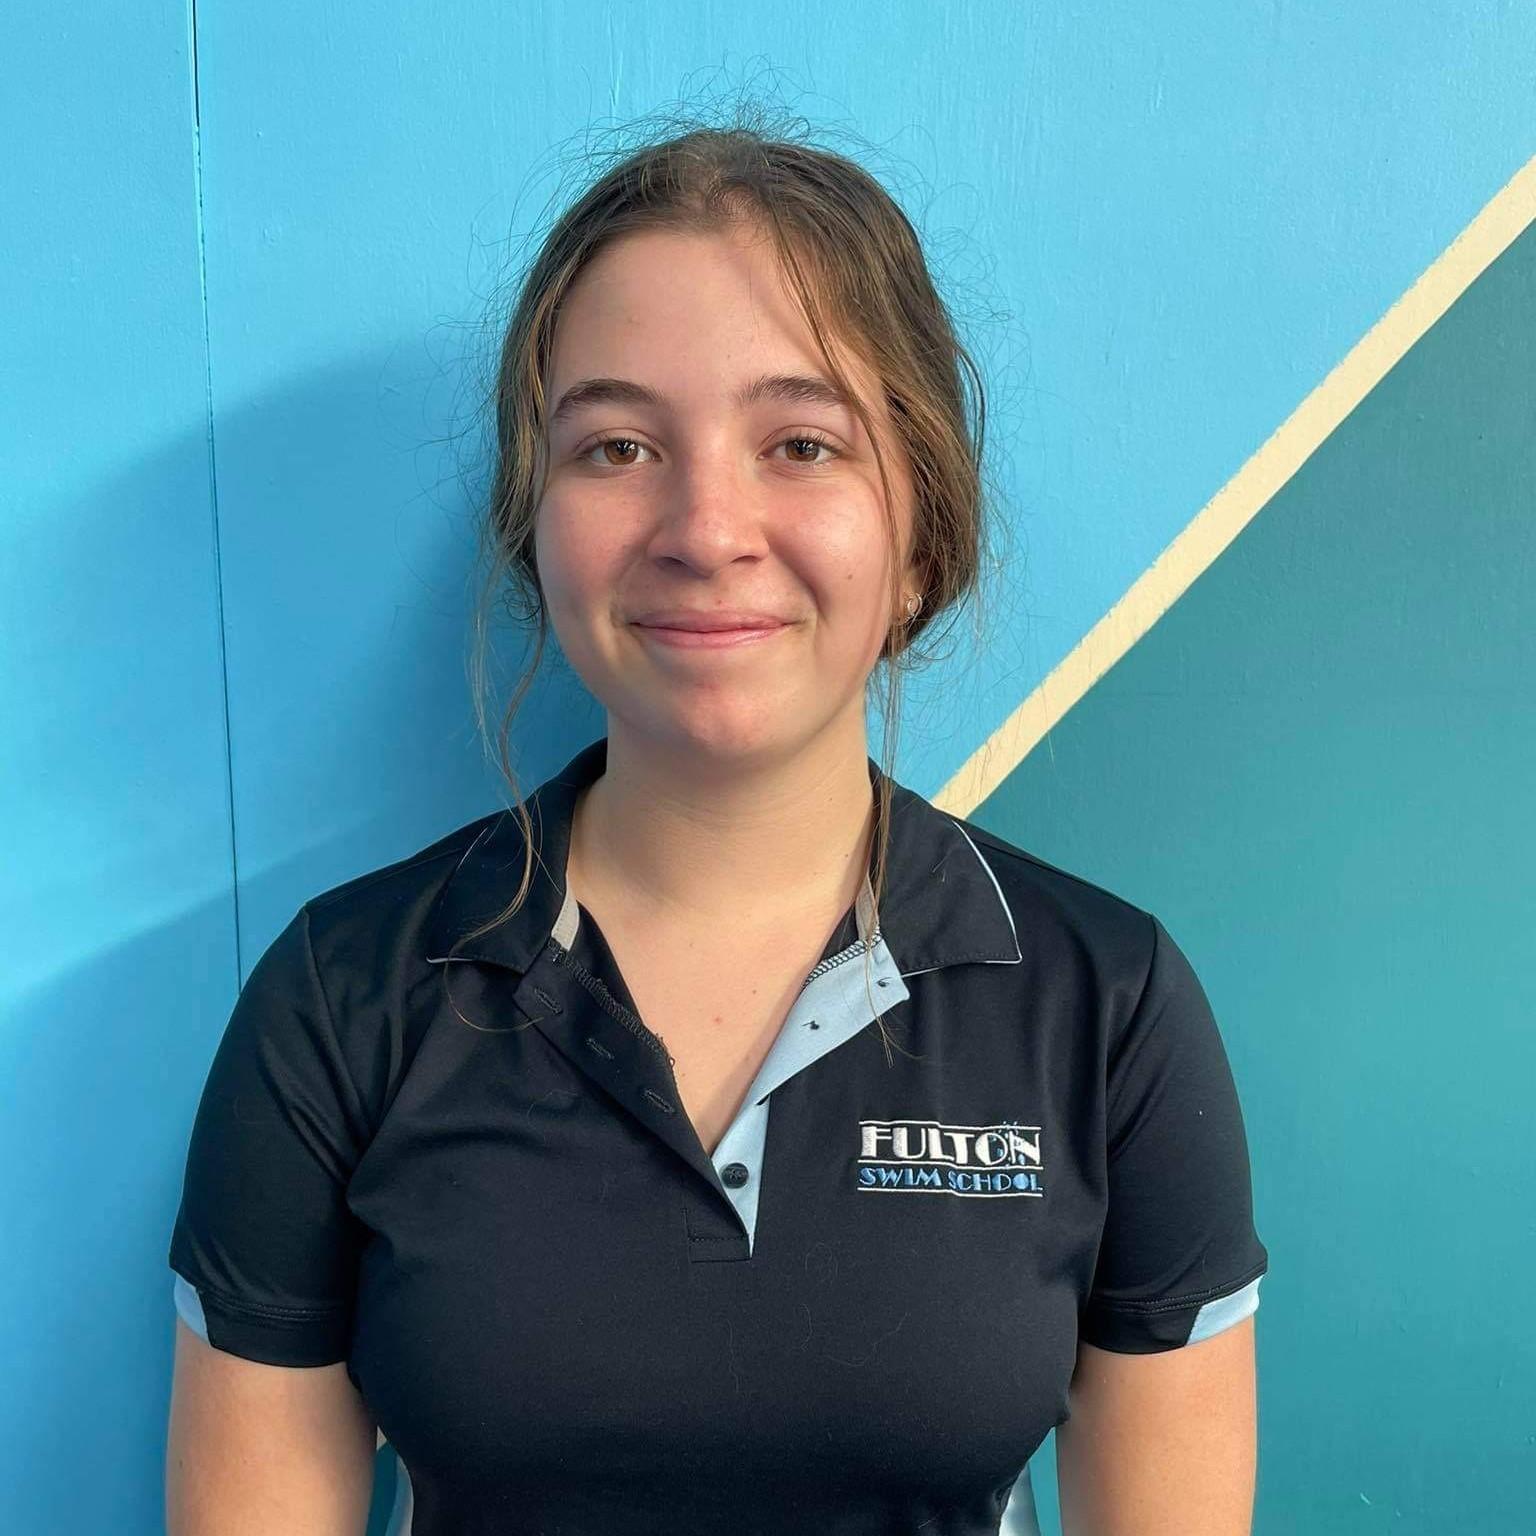 Caitlin - Fulton Swim School Teacher